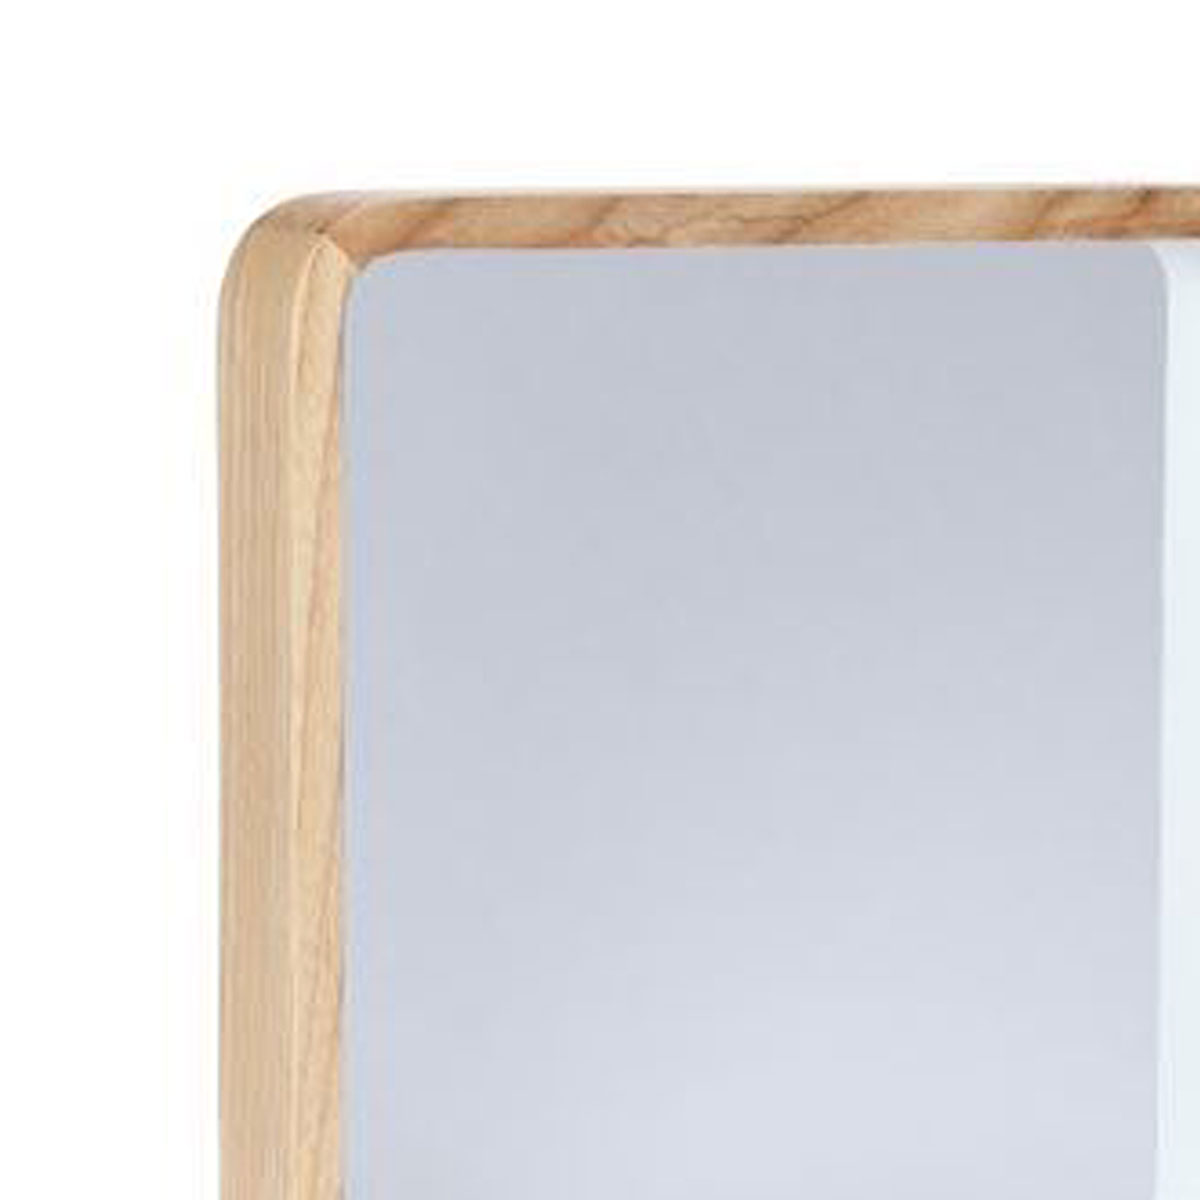 Minimalist Design Ynara Organic Wall Mirror Luxe Mirror